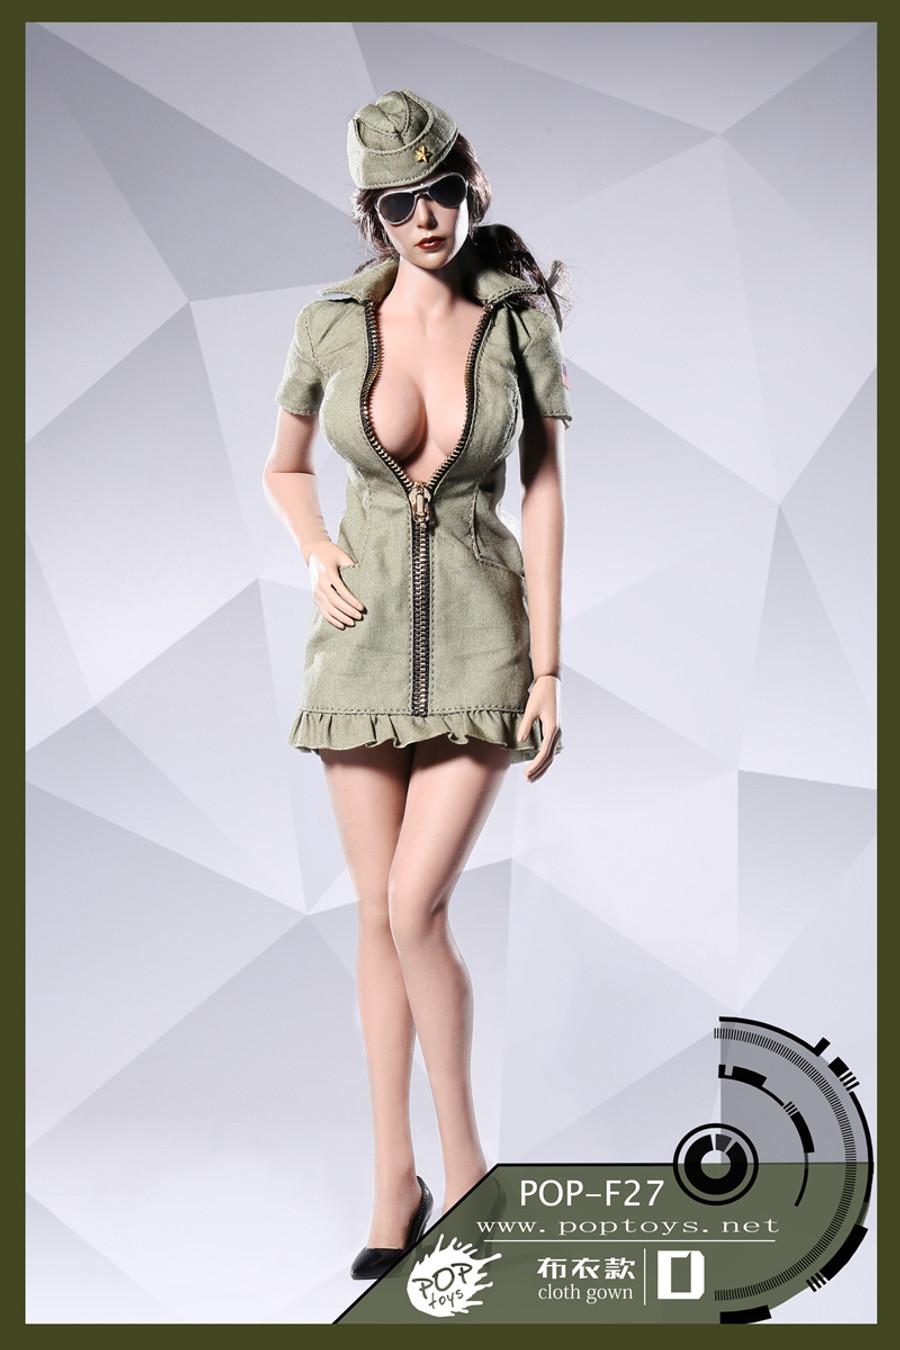 Pop Toys - Sexy War Women Suit Cloth Version